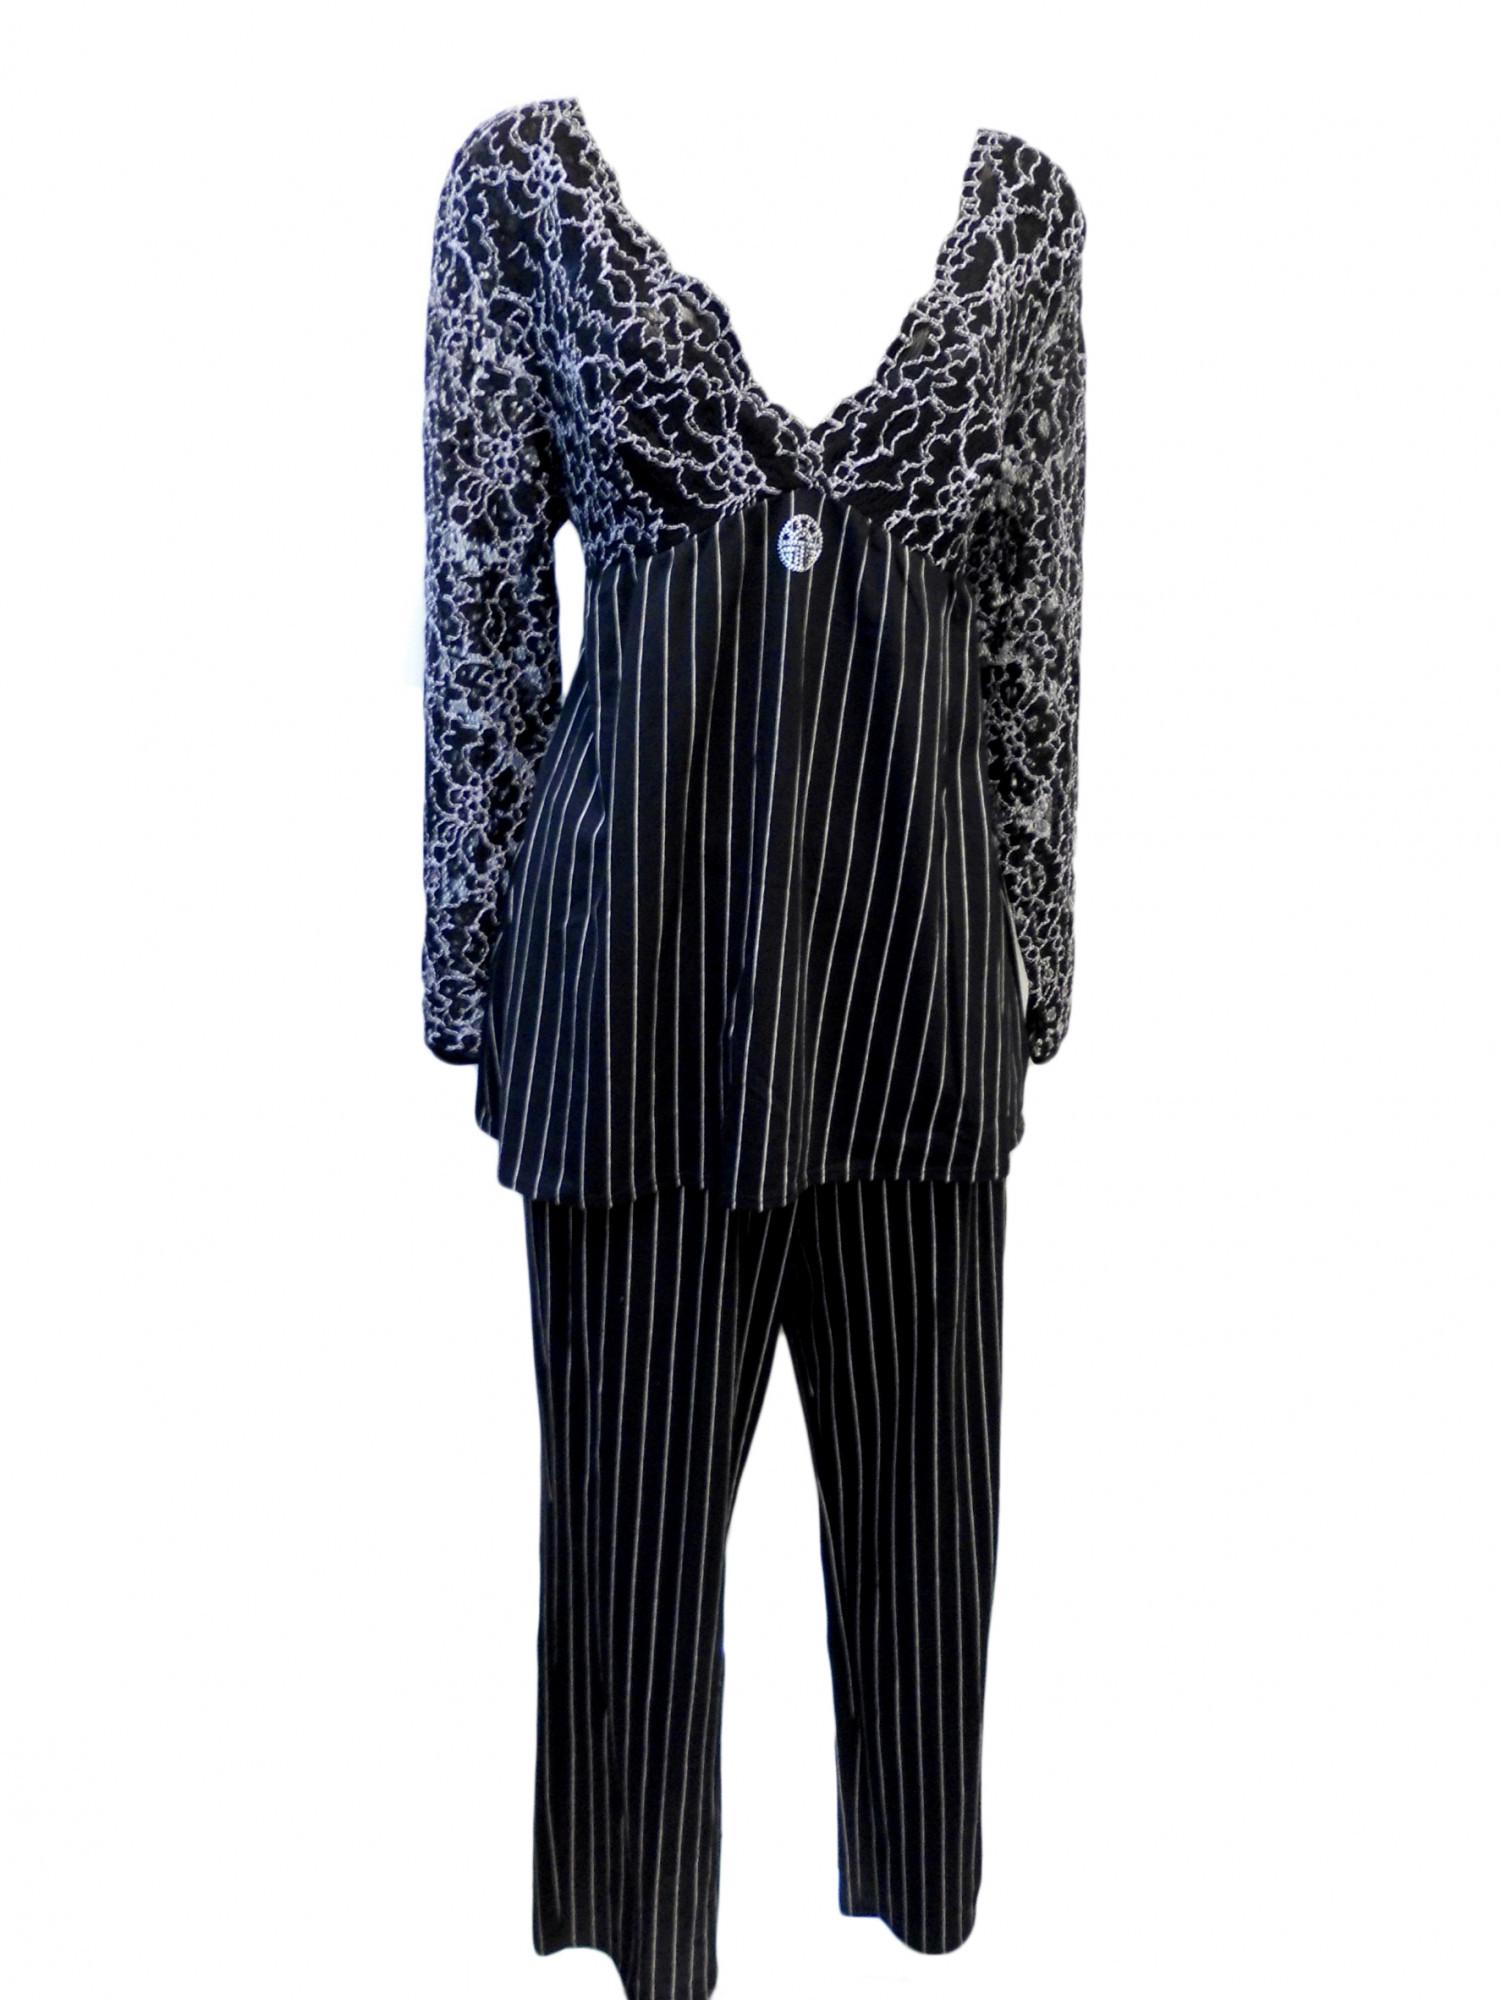 Dámské pyžamo 3211132 - Féraud černá 42